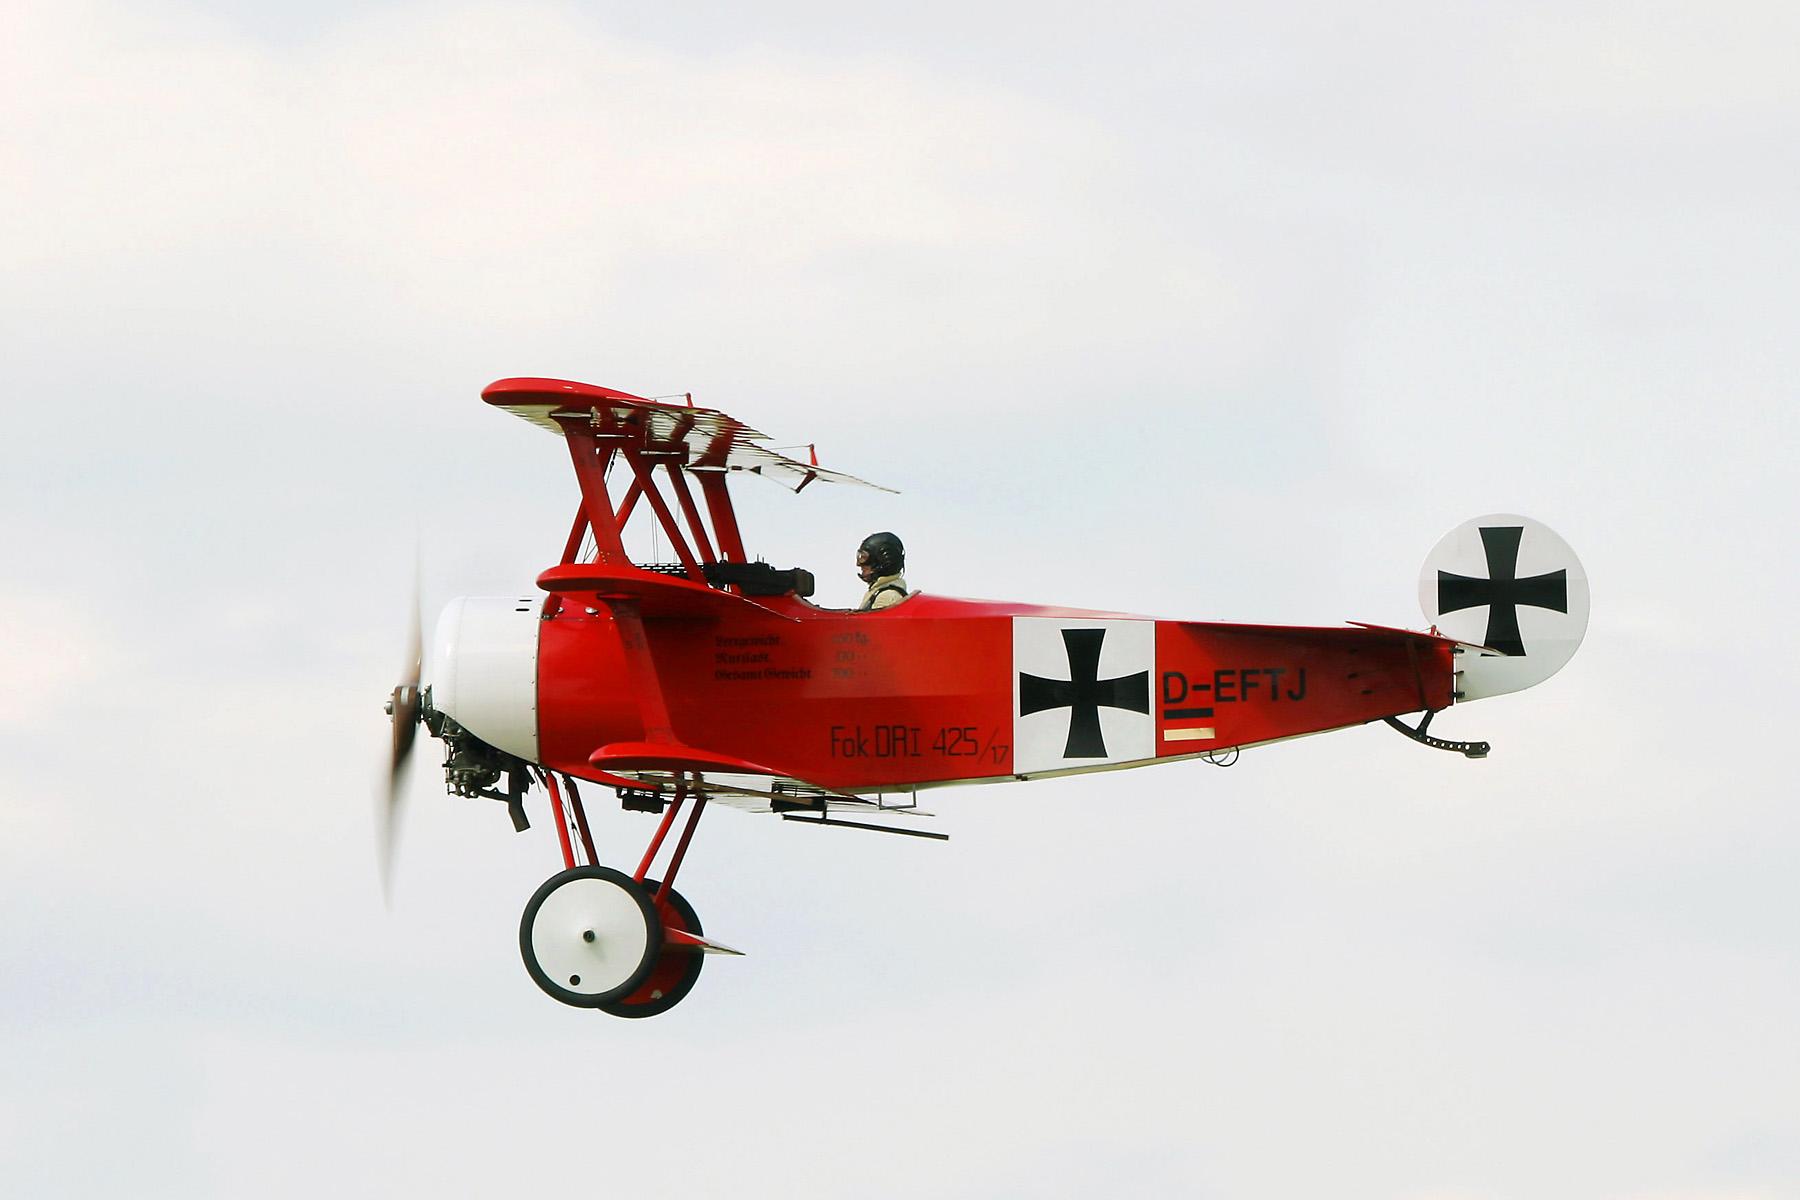 http://upload.wikimedia.org/wikipedia/commons/9/9b/Fokker_DR_1_ILA_2004.jpg